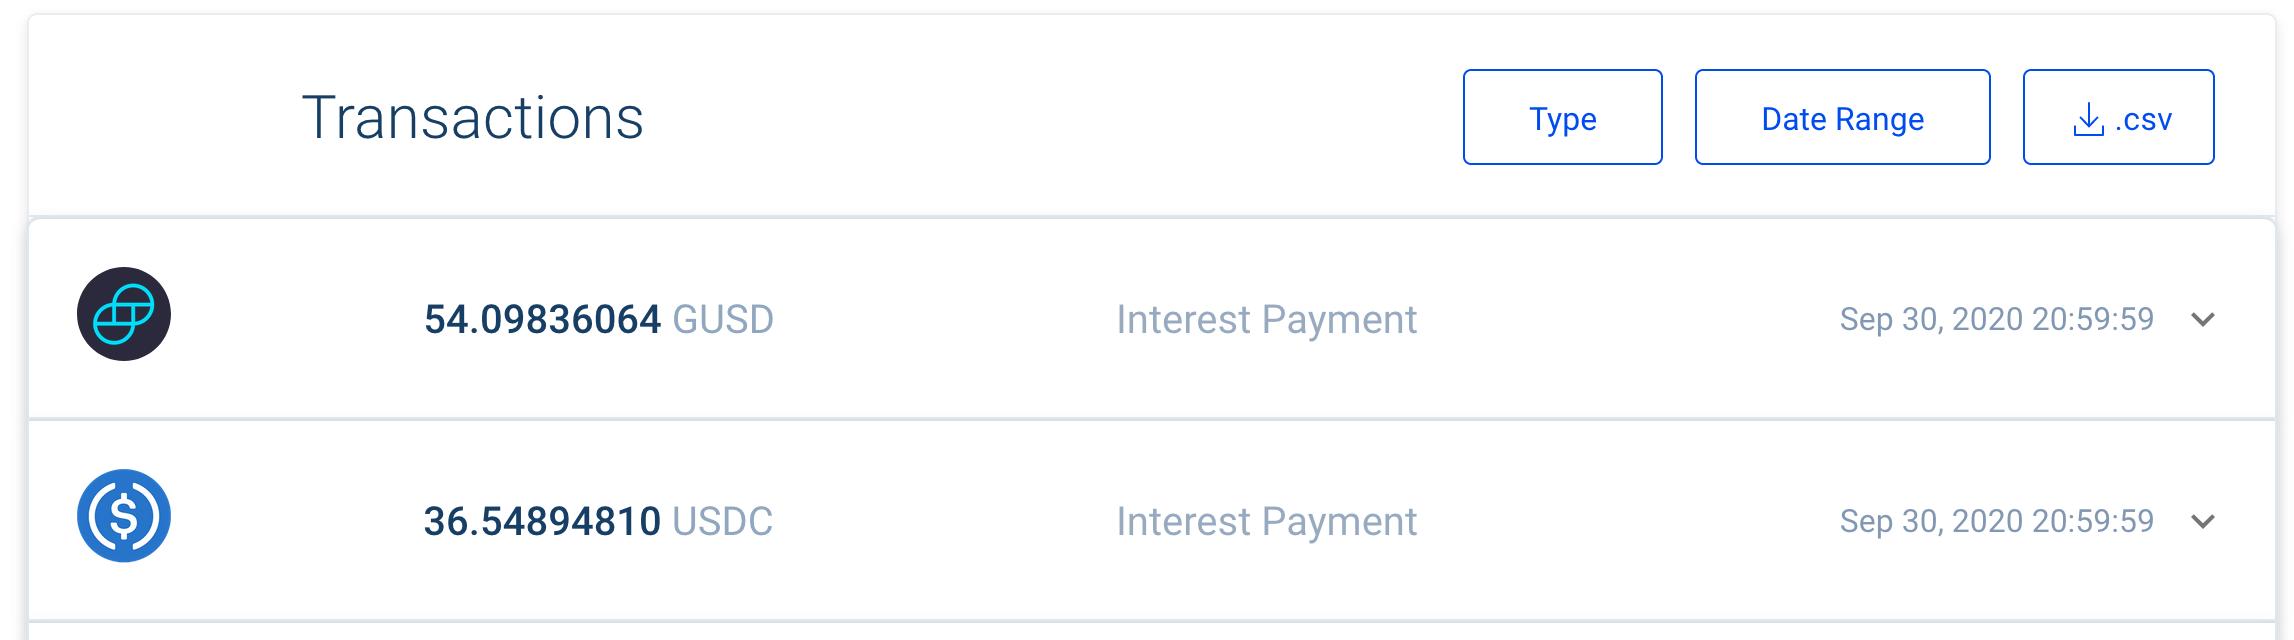 blockfi-interest-rates-screenshot-gusd-usdc-earn-interest